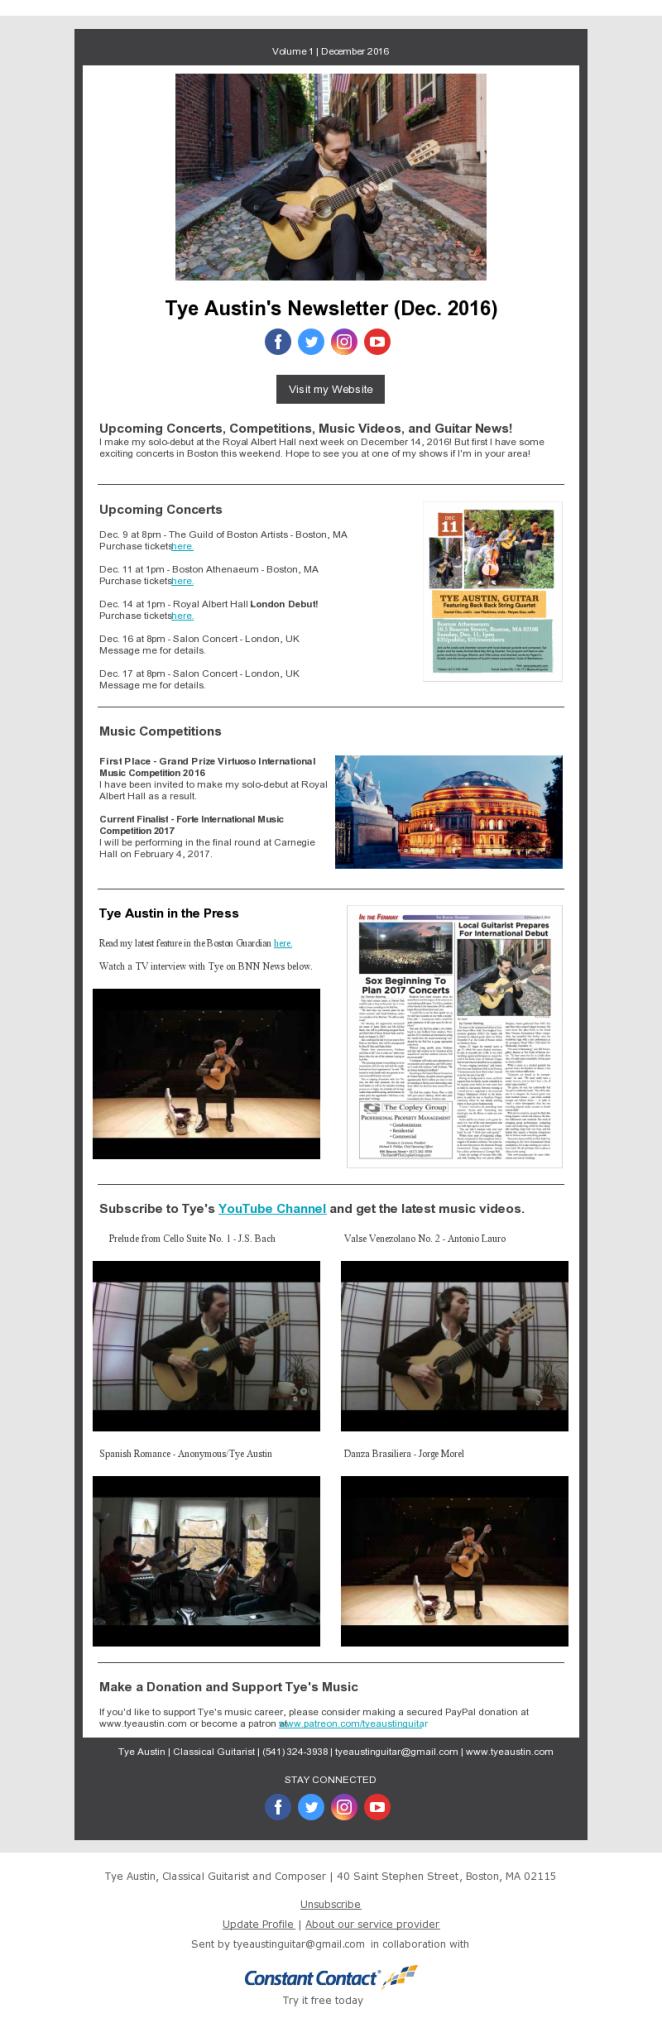 tye-austins-newsletter-december-2016